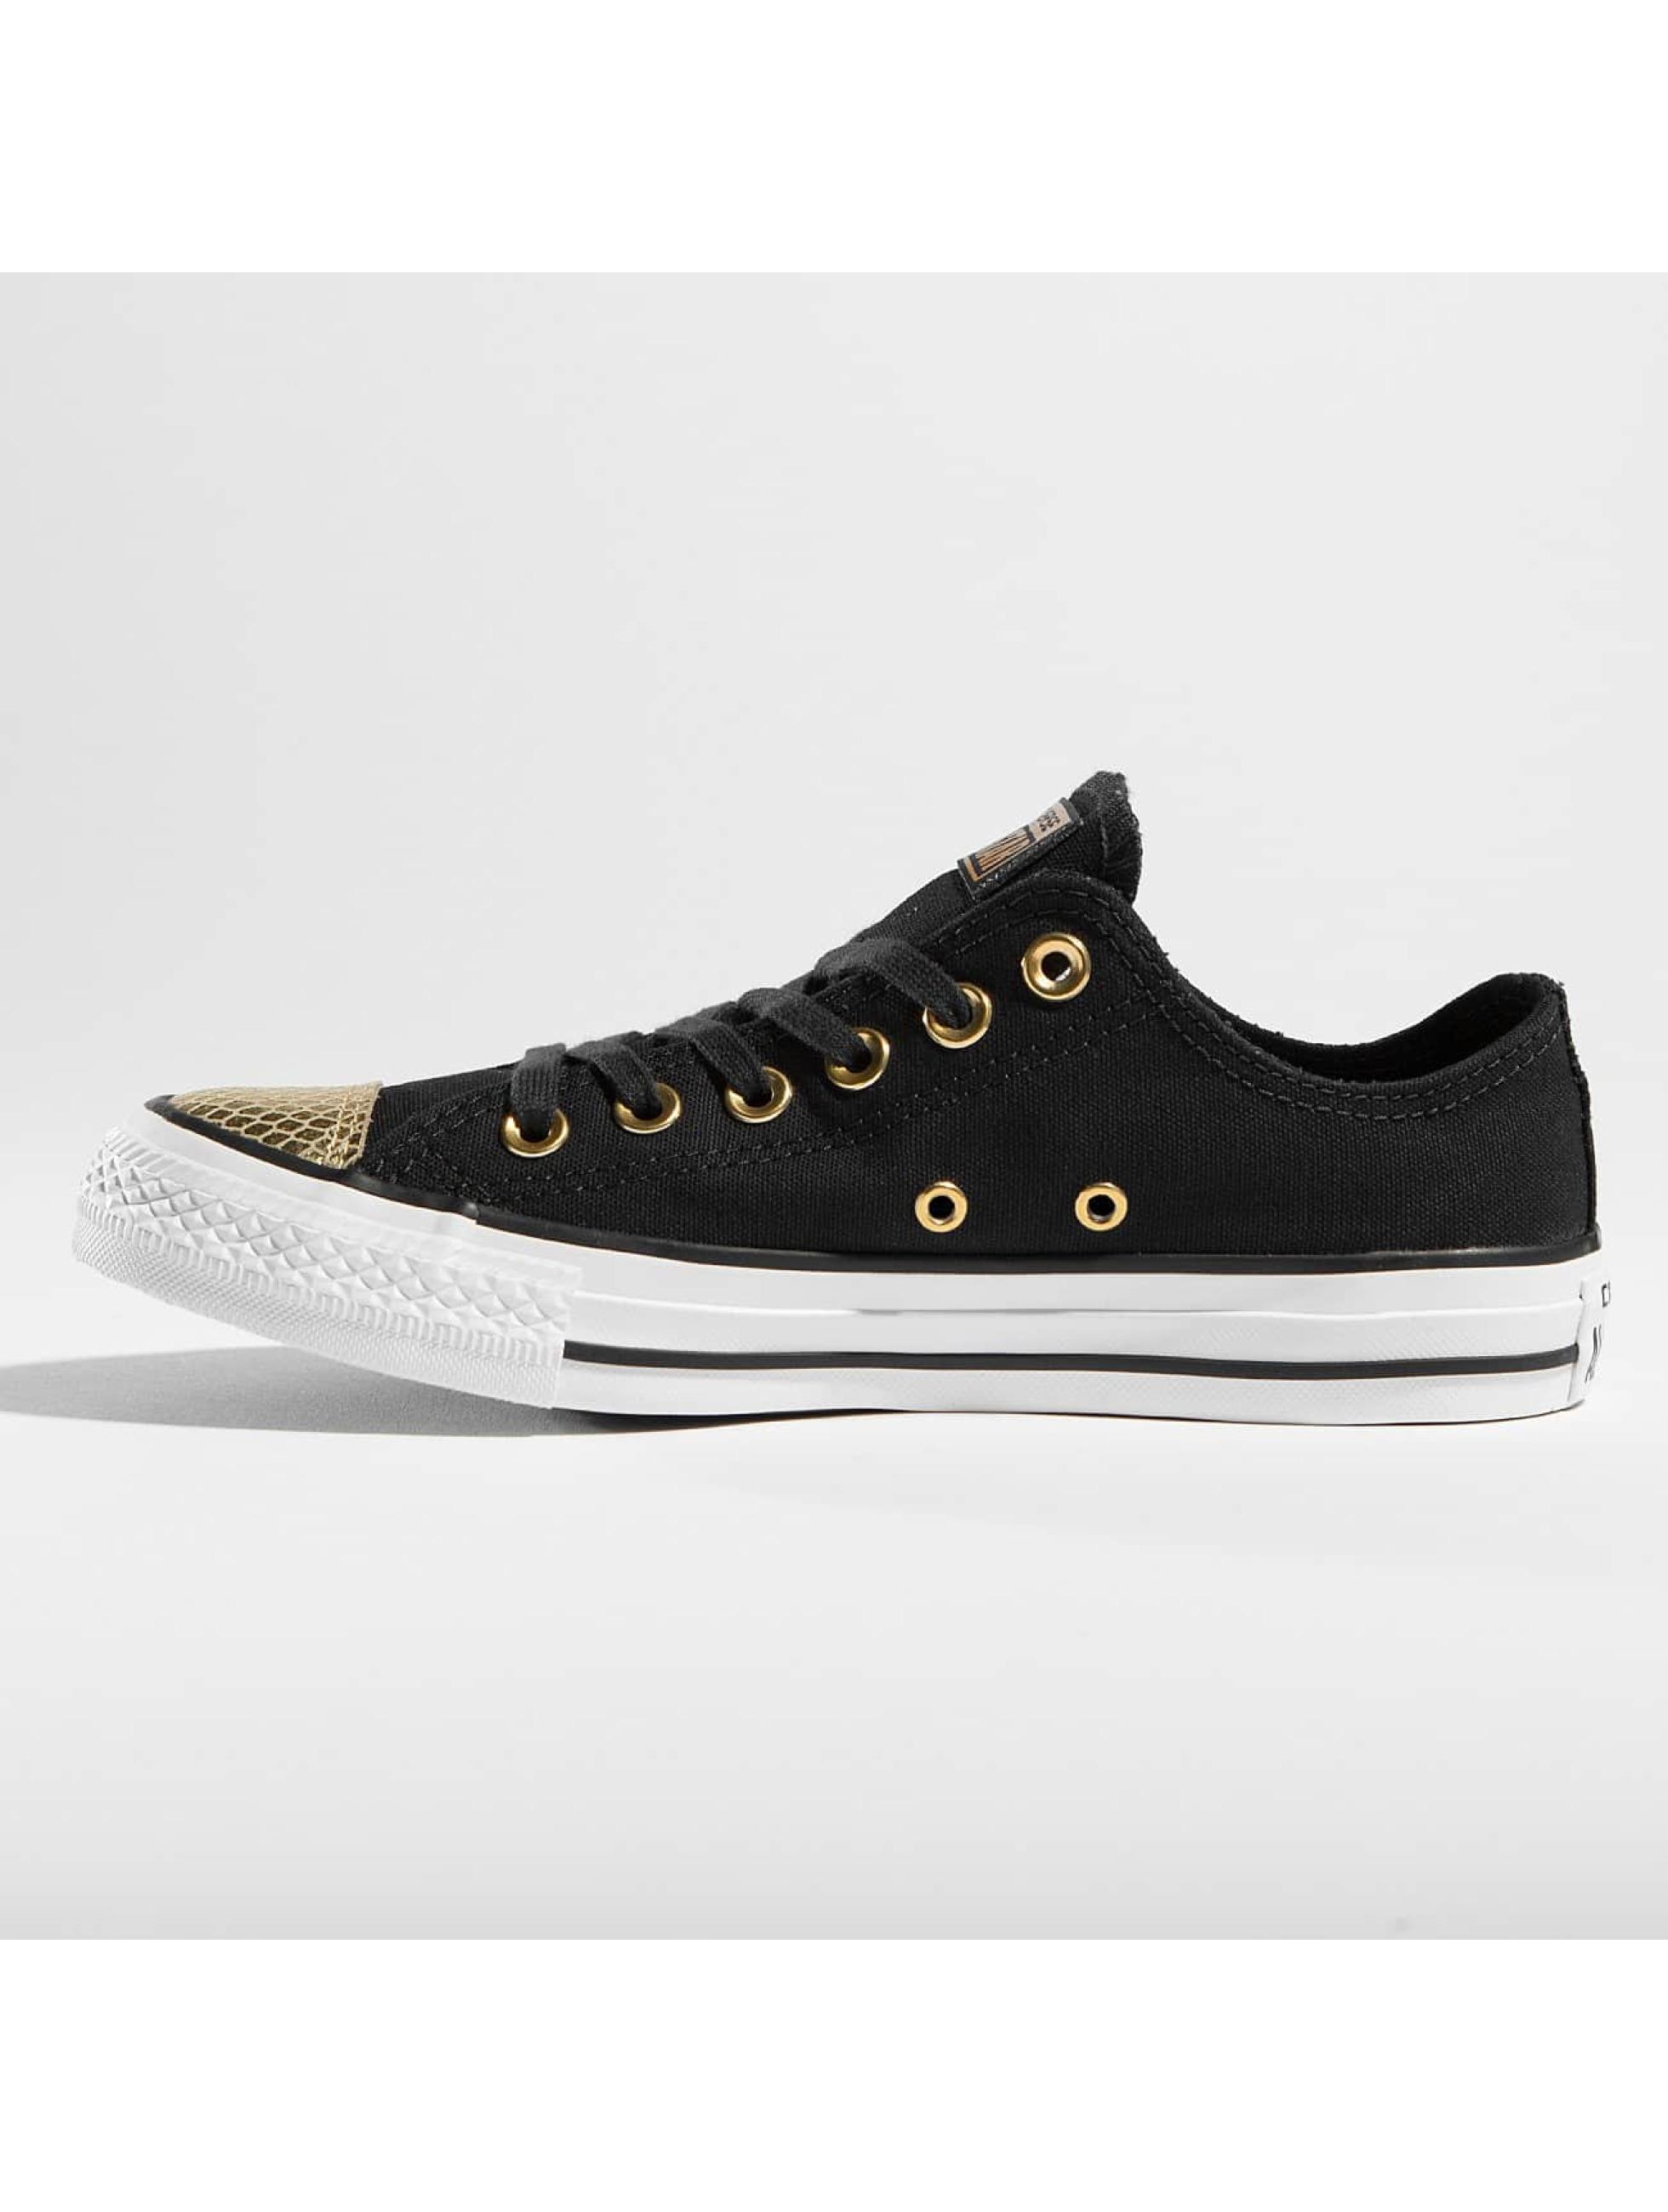 converse damen sneaker ox in schwarz 328133. Black Bedroom Furniture Sets. Home Design Ideas